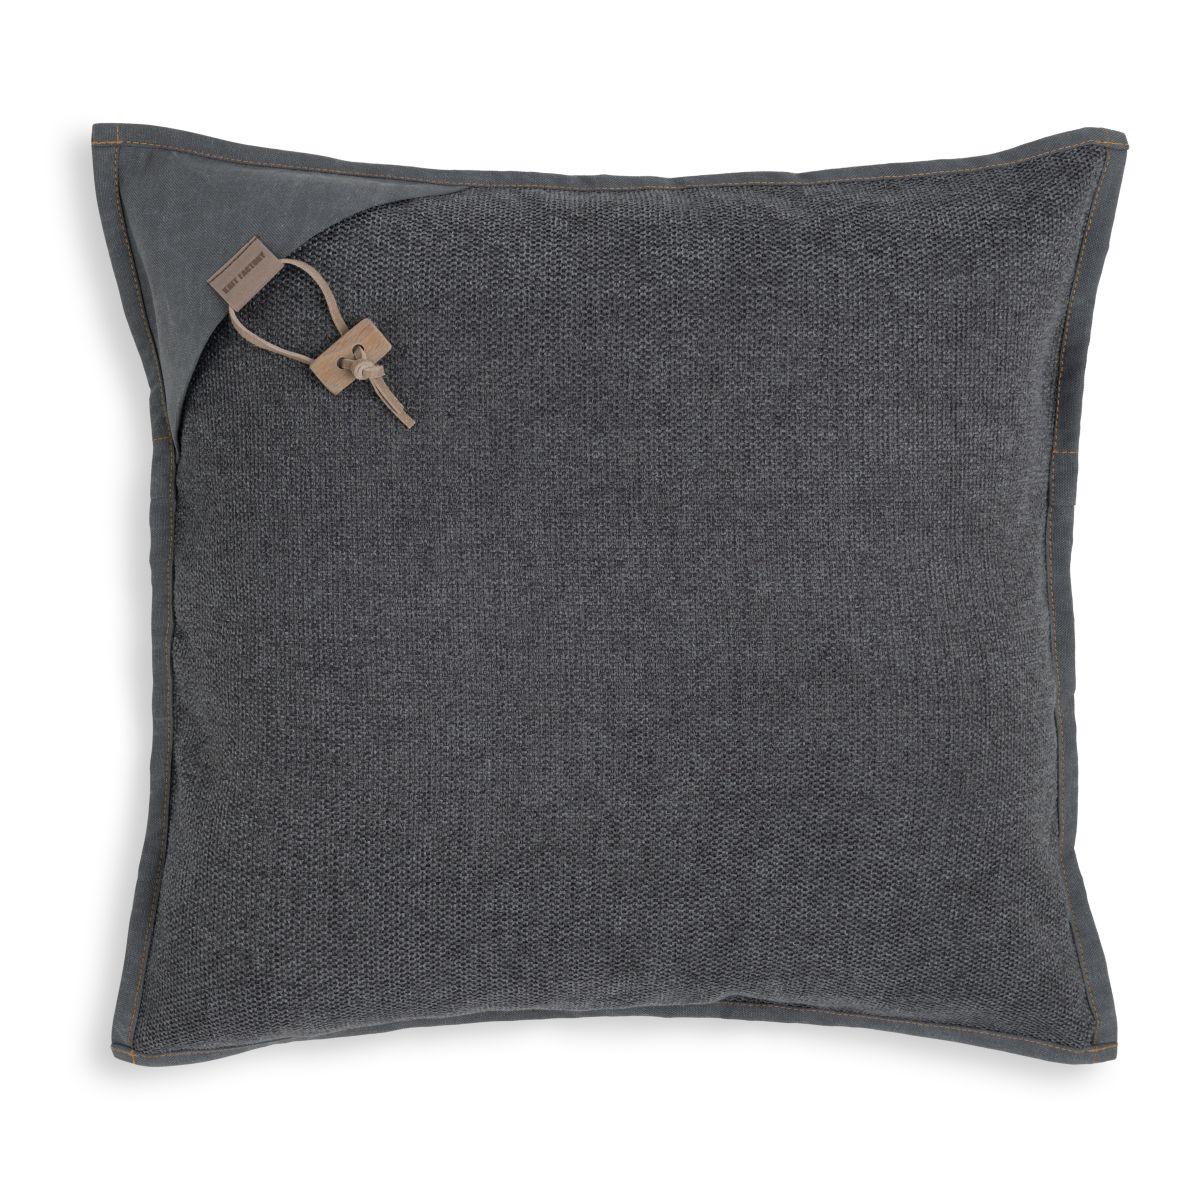 knit factory kf154012010 hope kussen antraciet 50x50 1